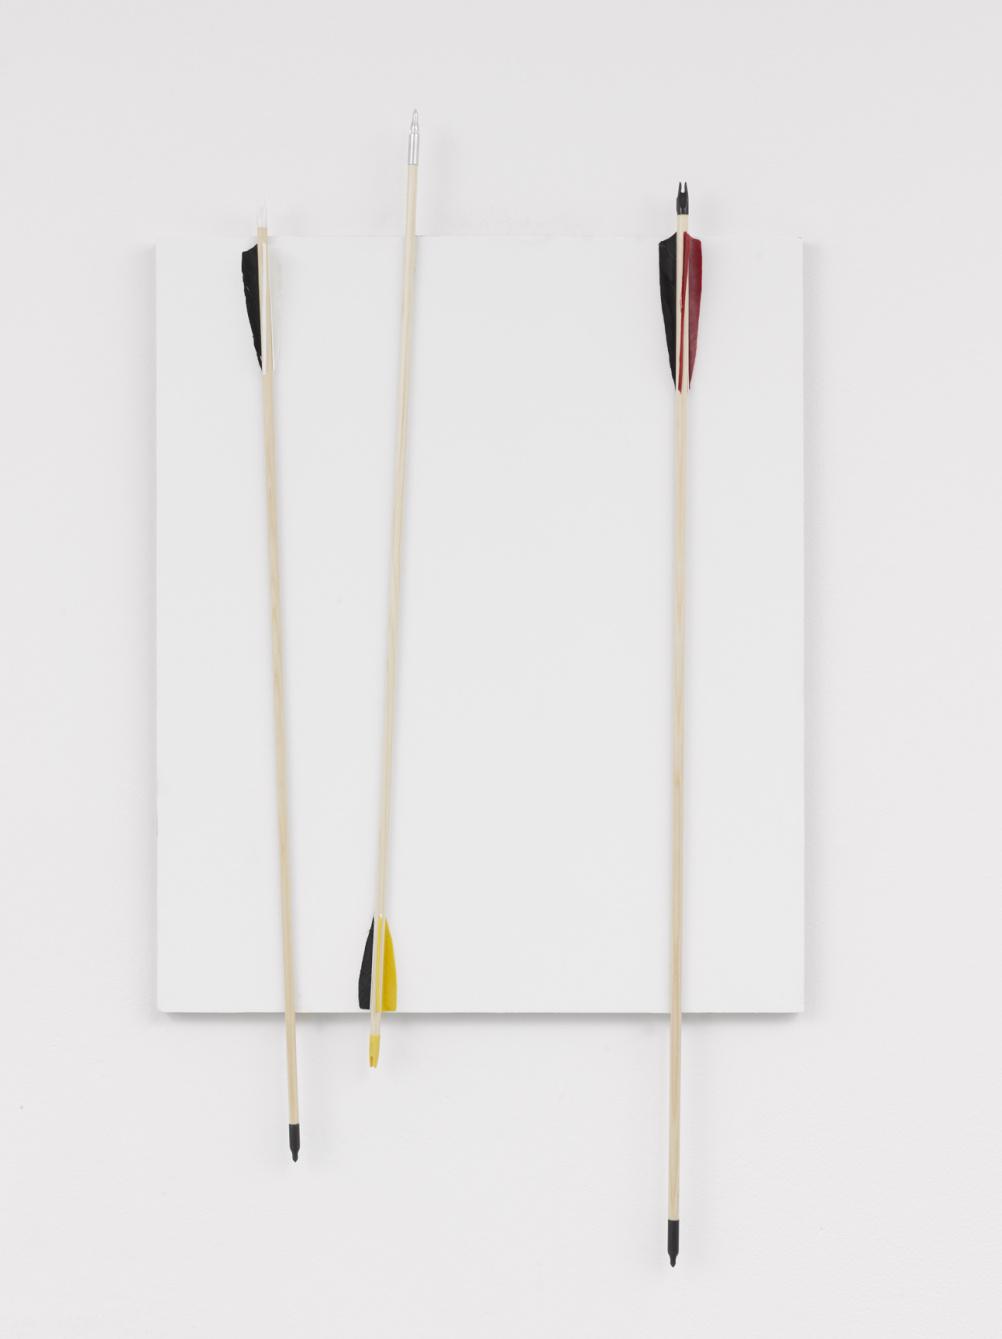 Three Arrows Goshka Macuga, 2013